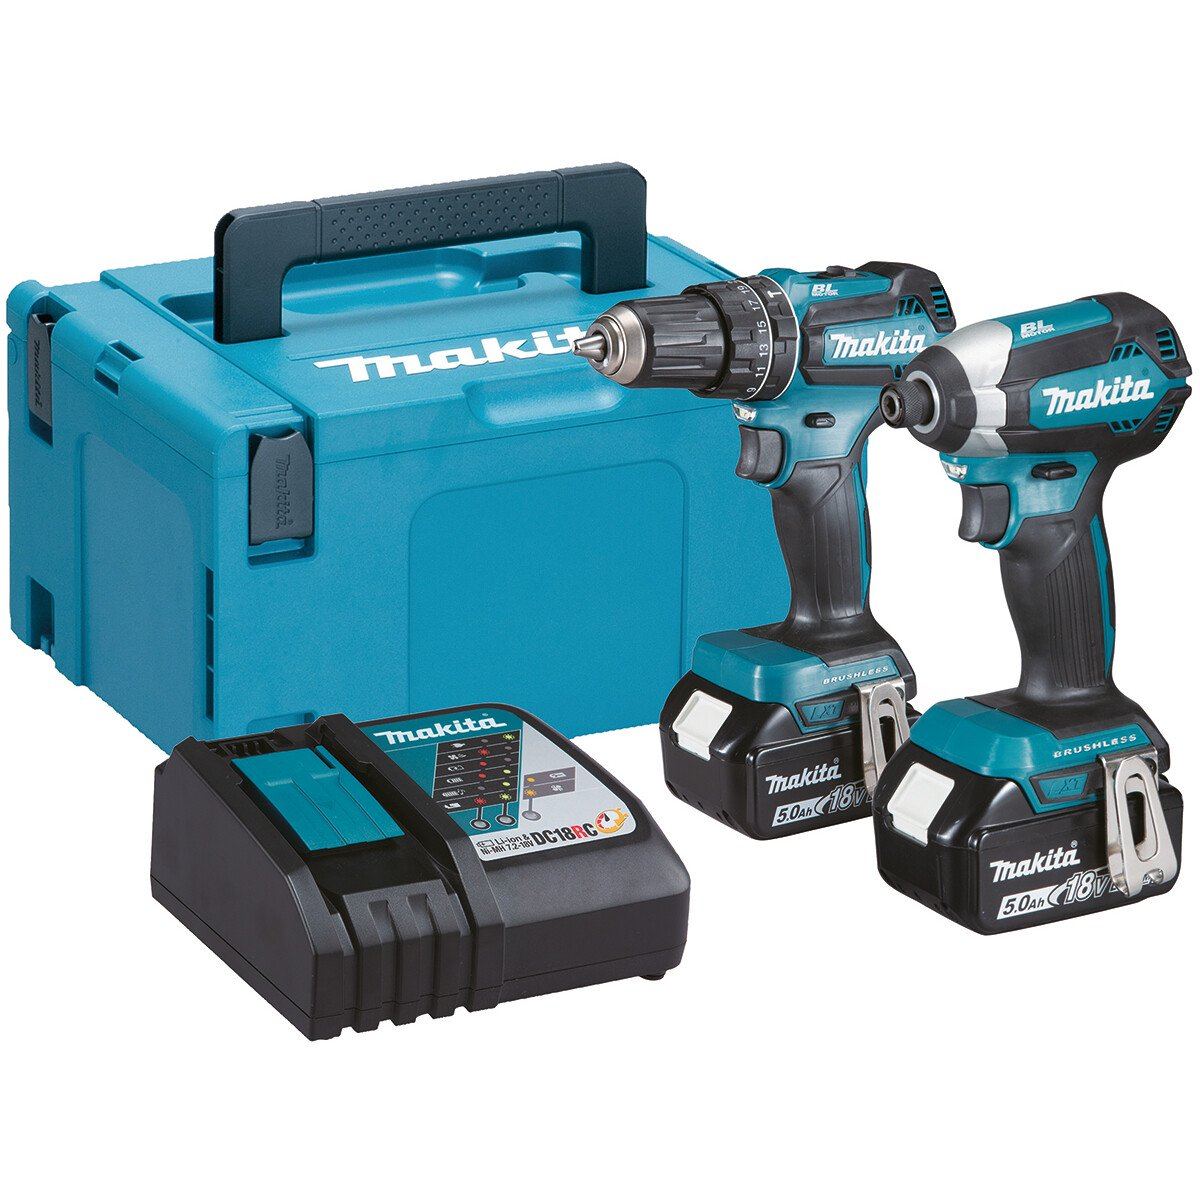 Makita DLX2283TJ 18v Brushless TwinKit Combi Drill + Impact Driver with 2x5Ah Batteries